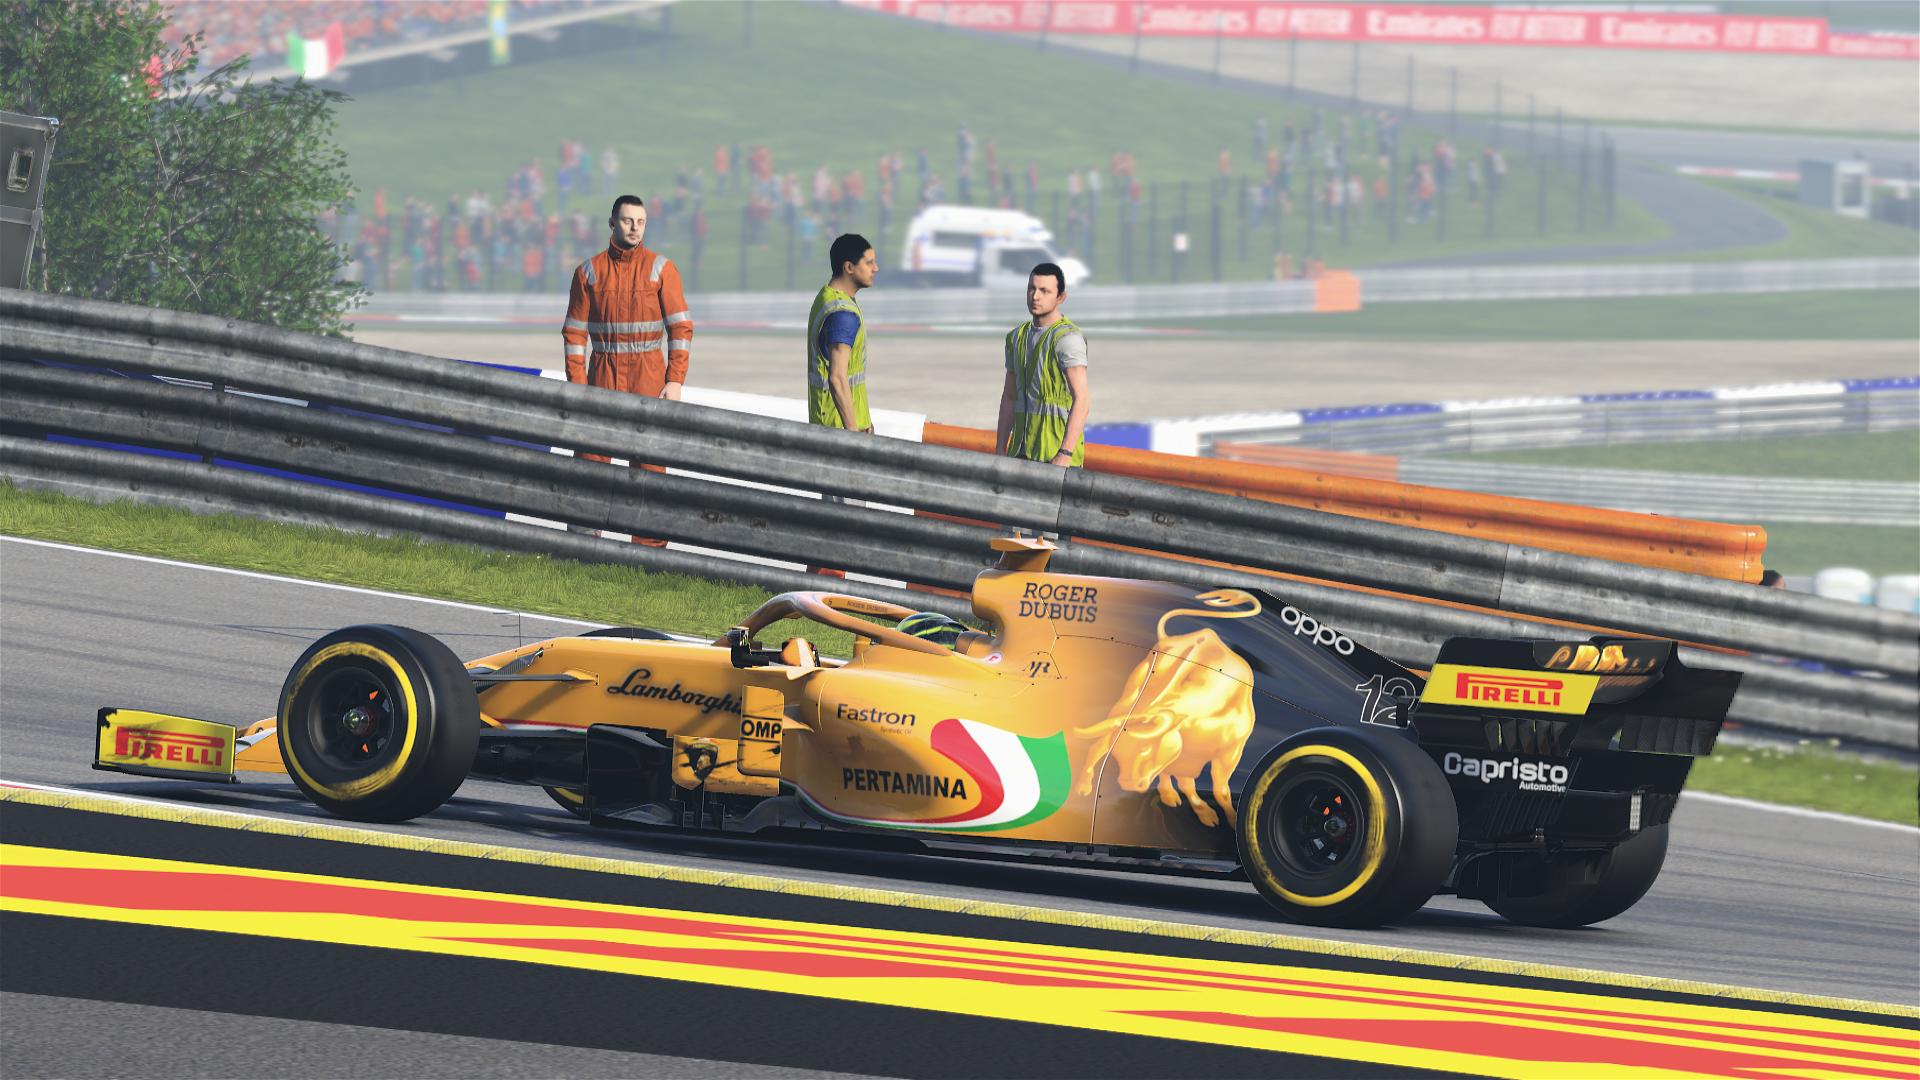 F1 2020 Screenshot 2021.09.25 - 00.28.38.41.png